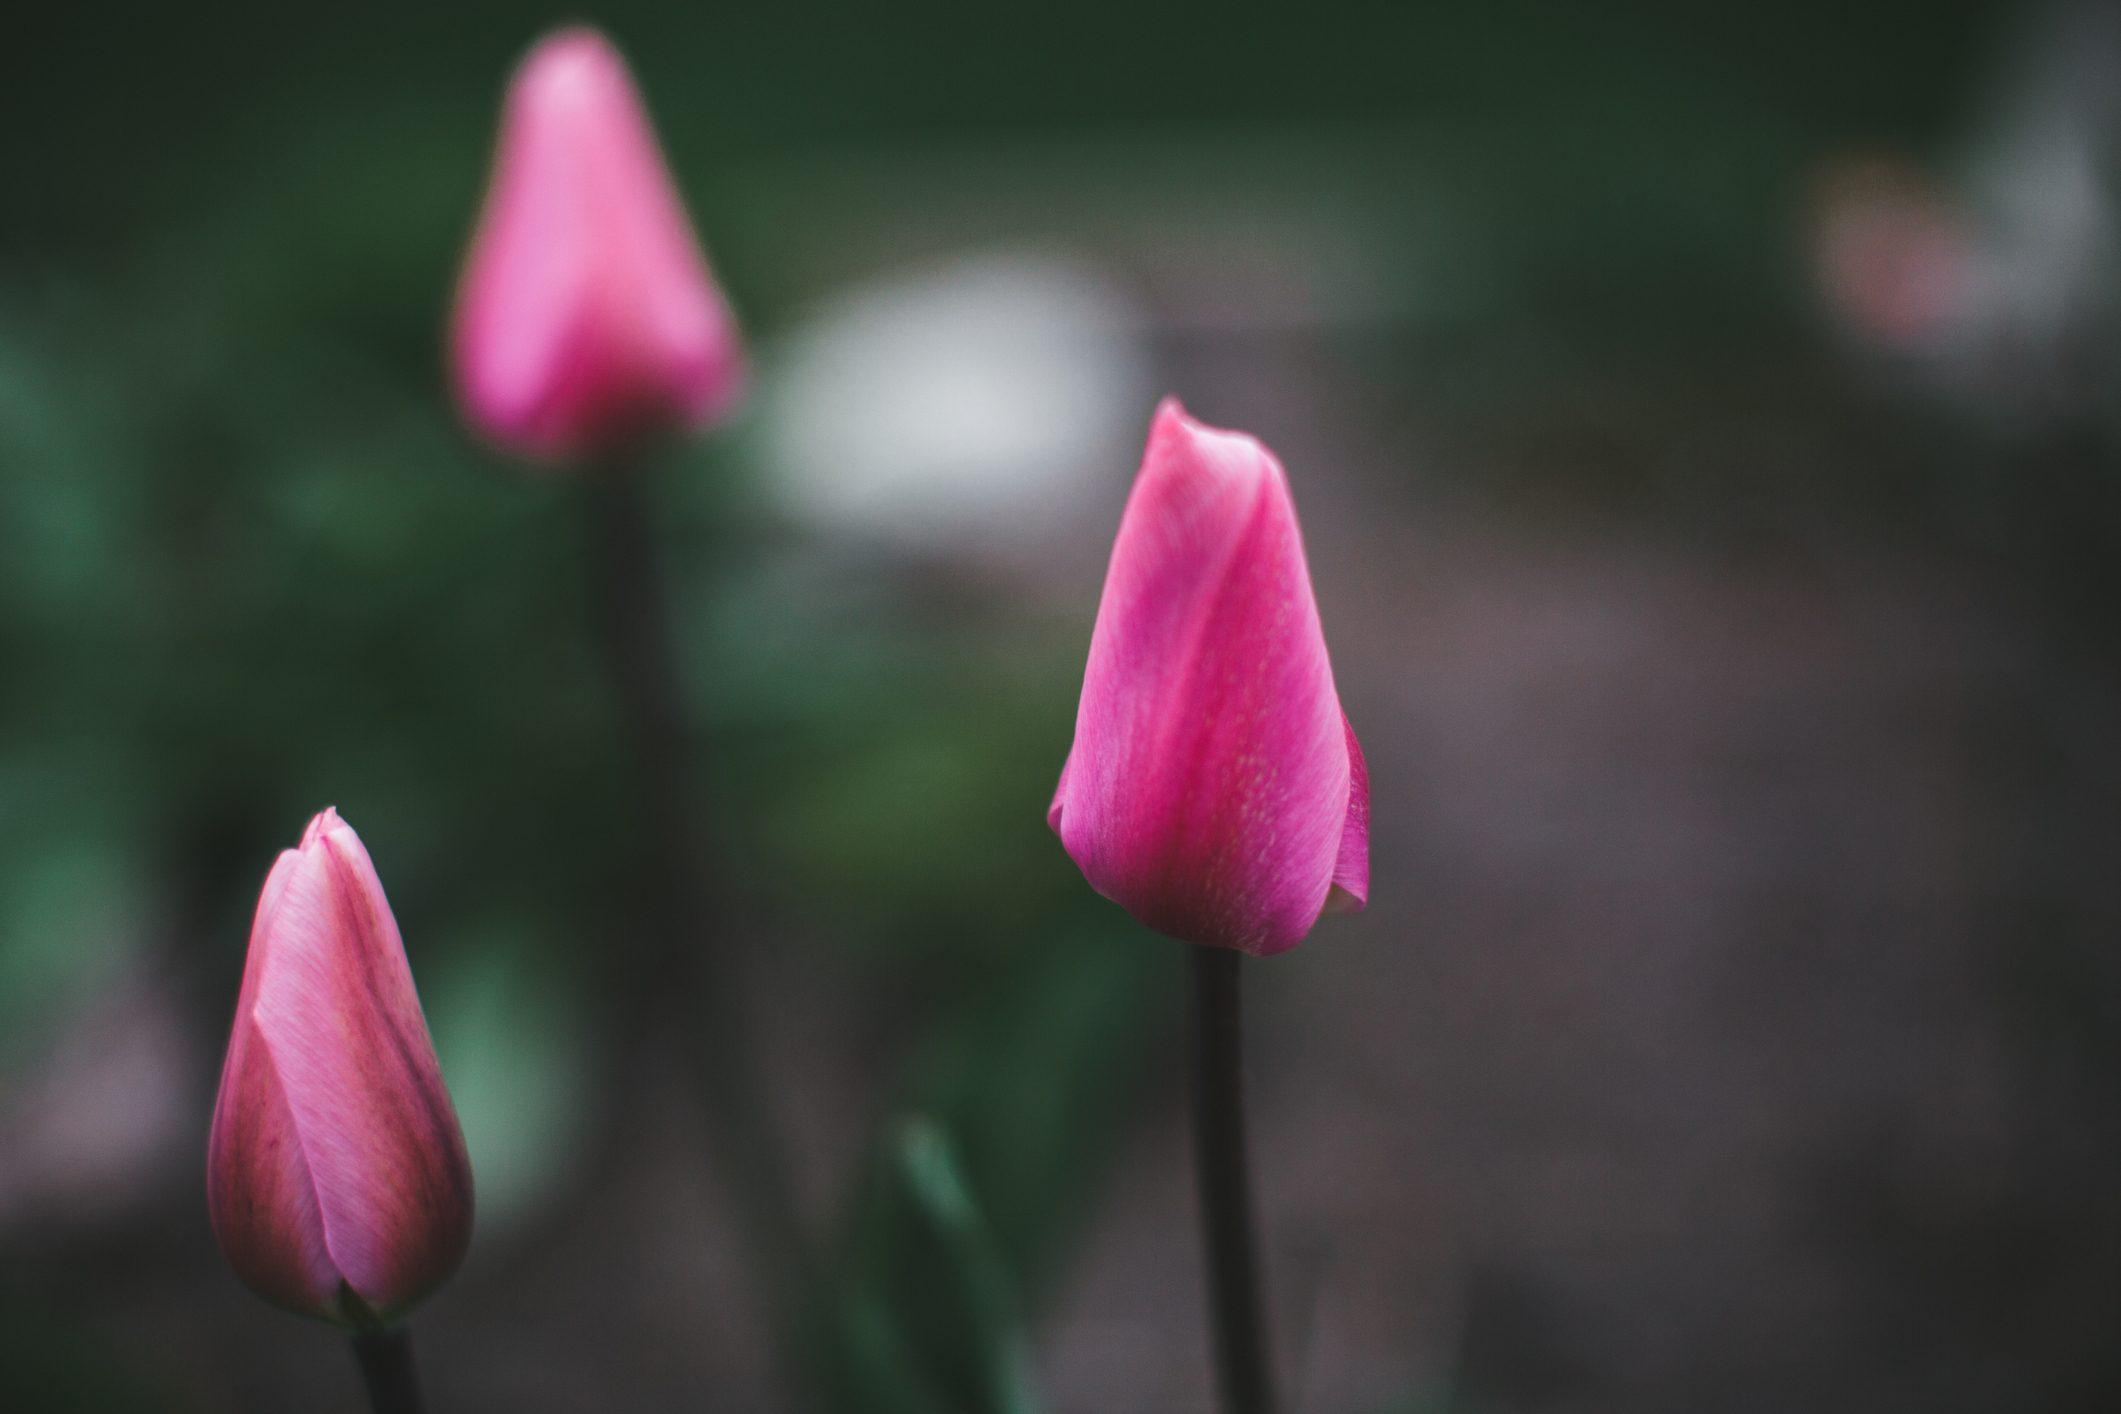 Tulips buds